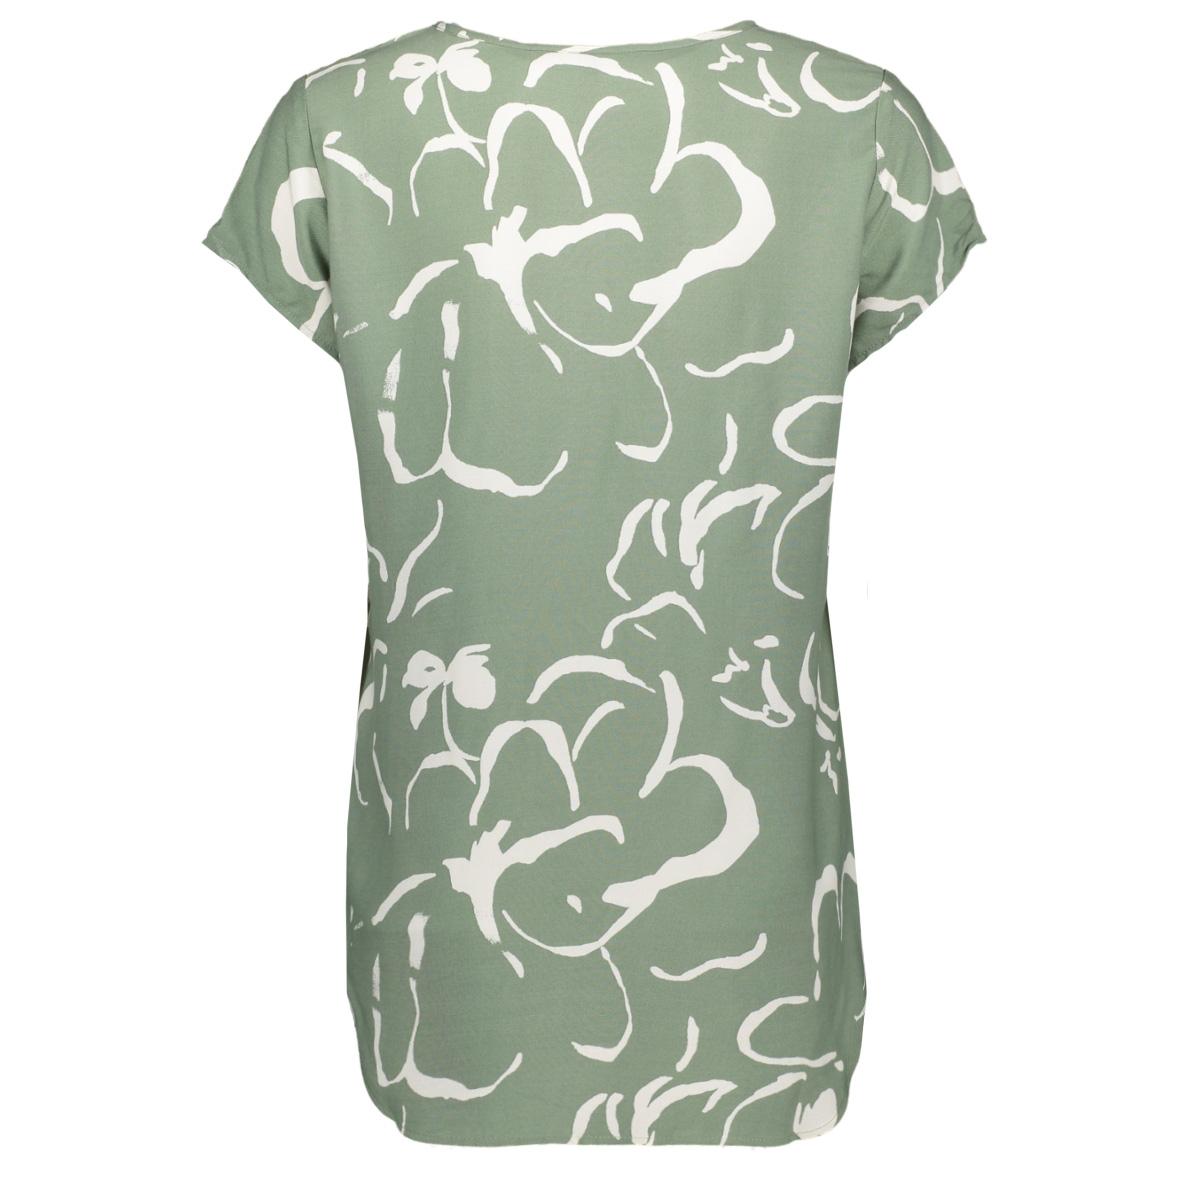 vmboca ss blouse multi aop 10132802 vero moda t-shirt hedge green/ilona coll